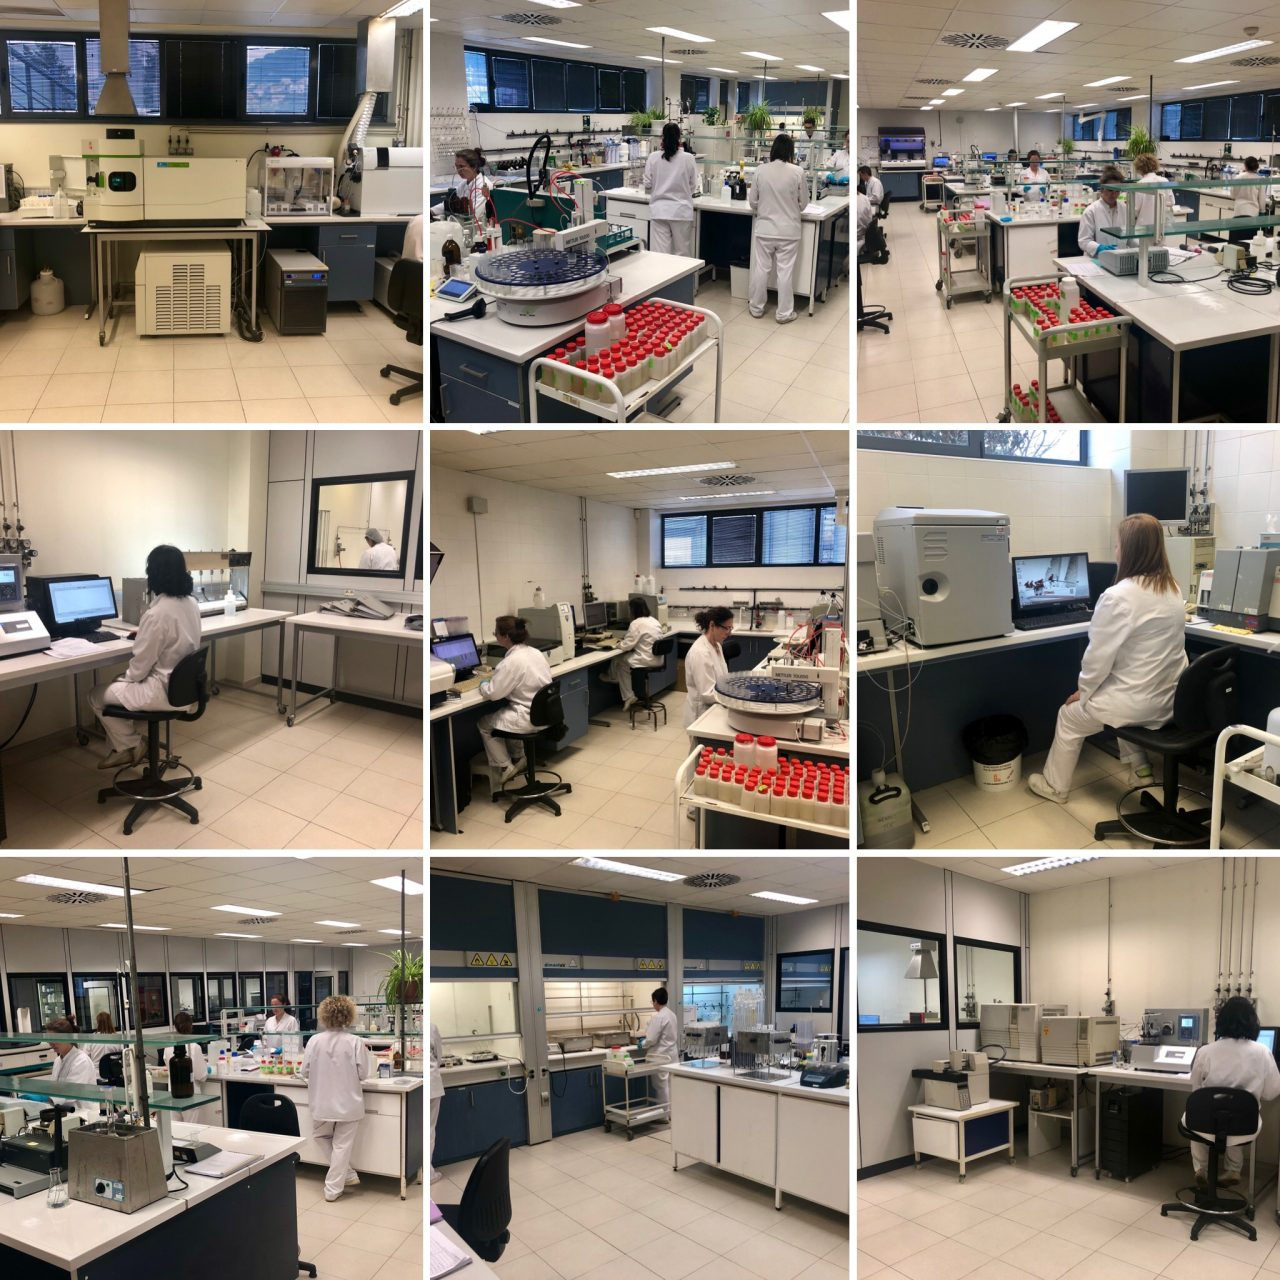 laboratorio-1280x1280.jpg